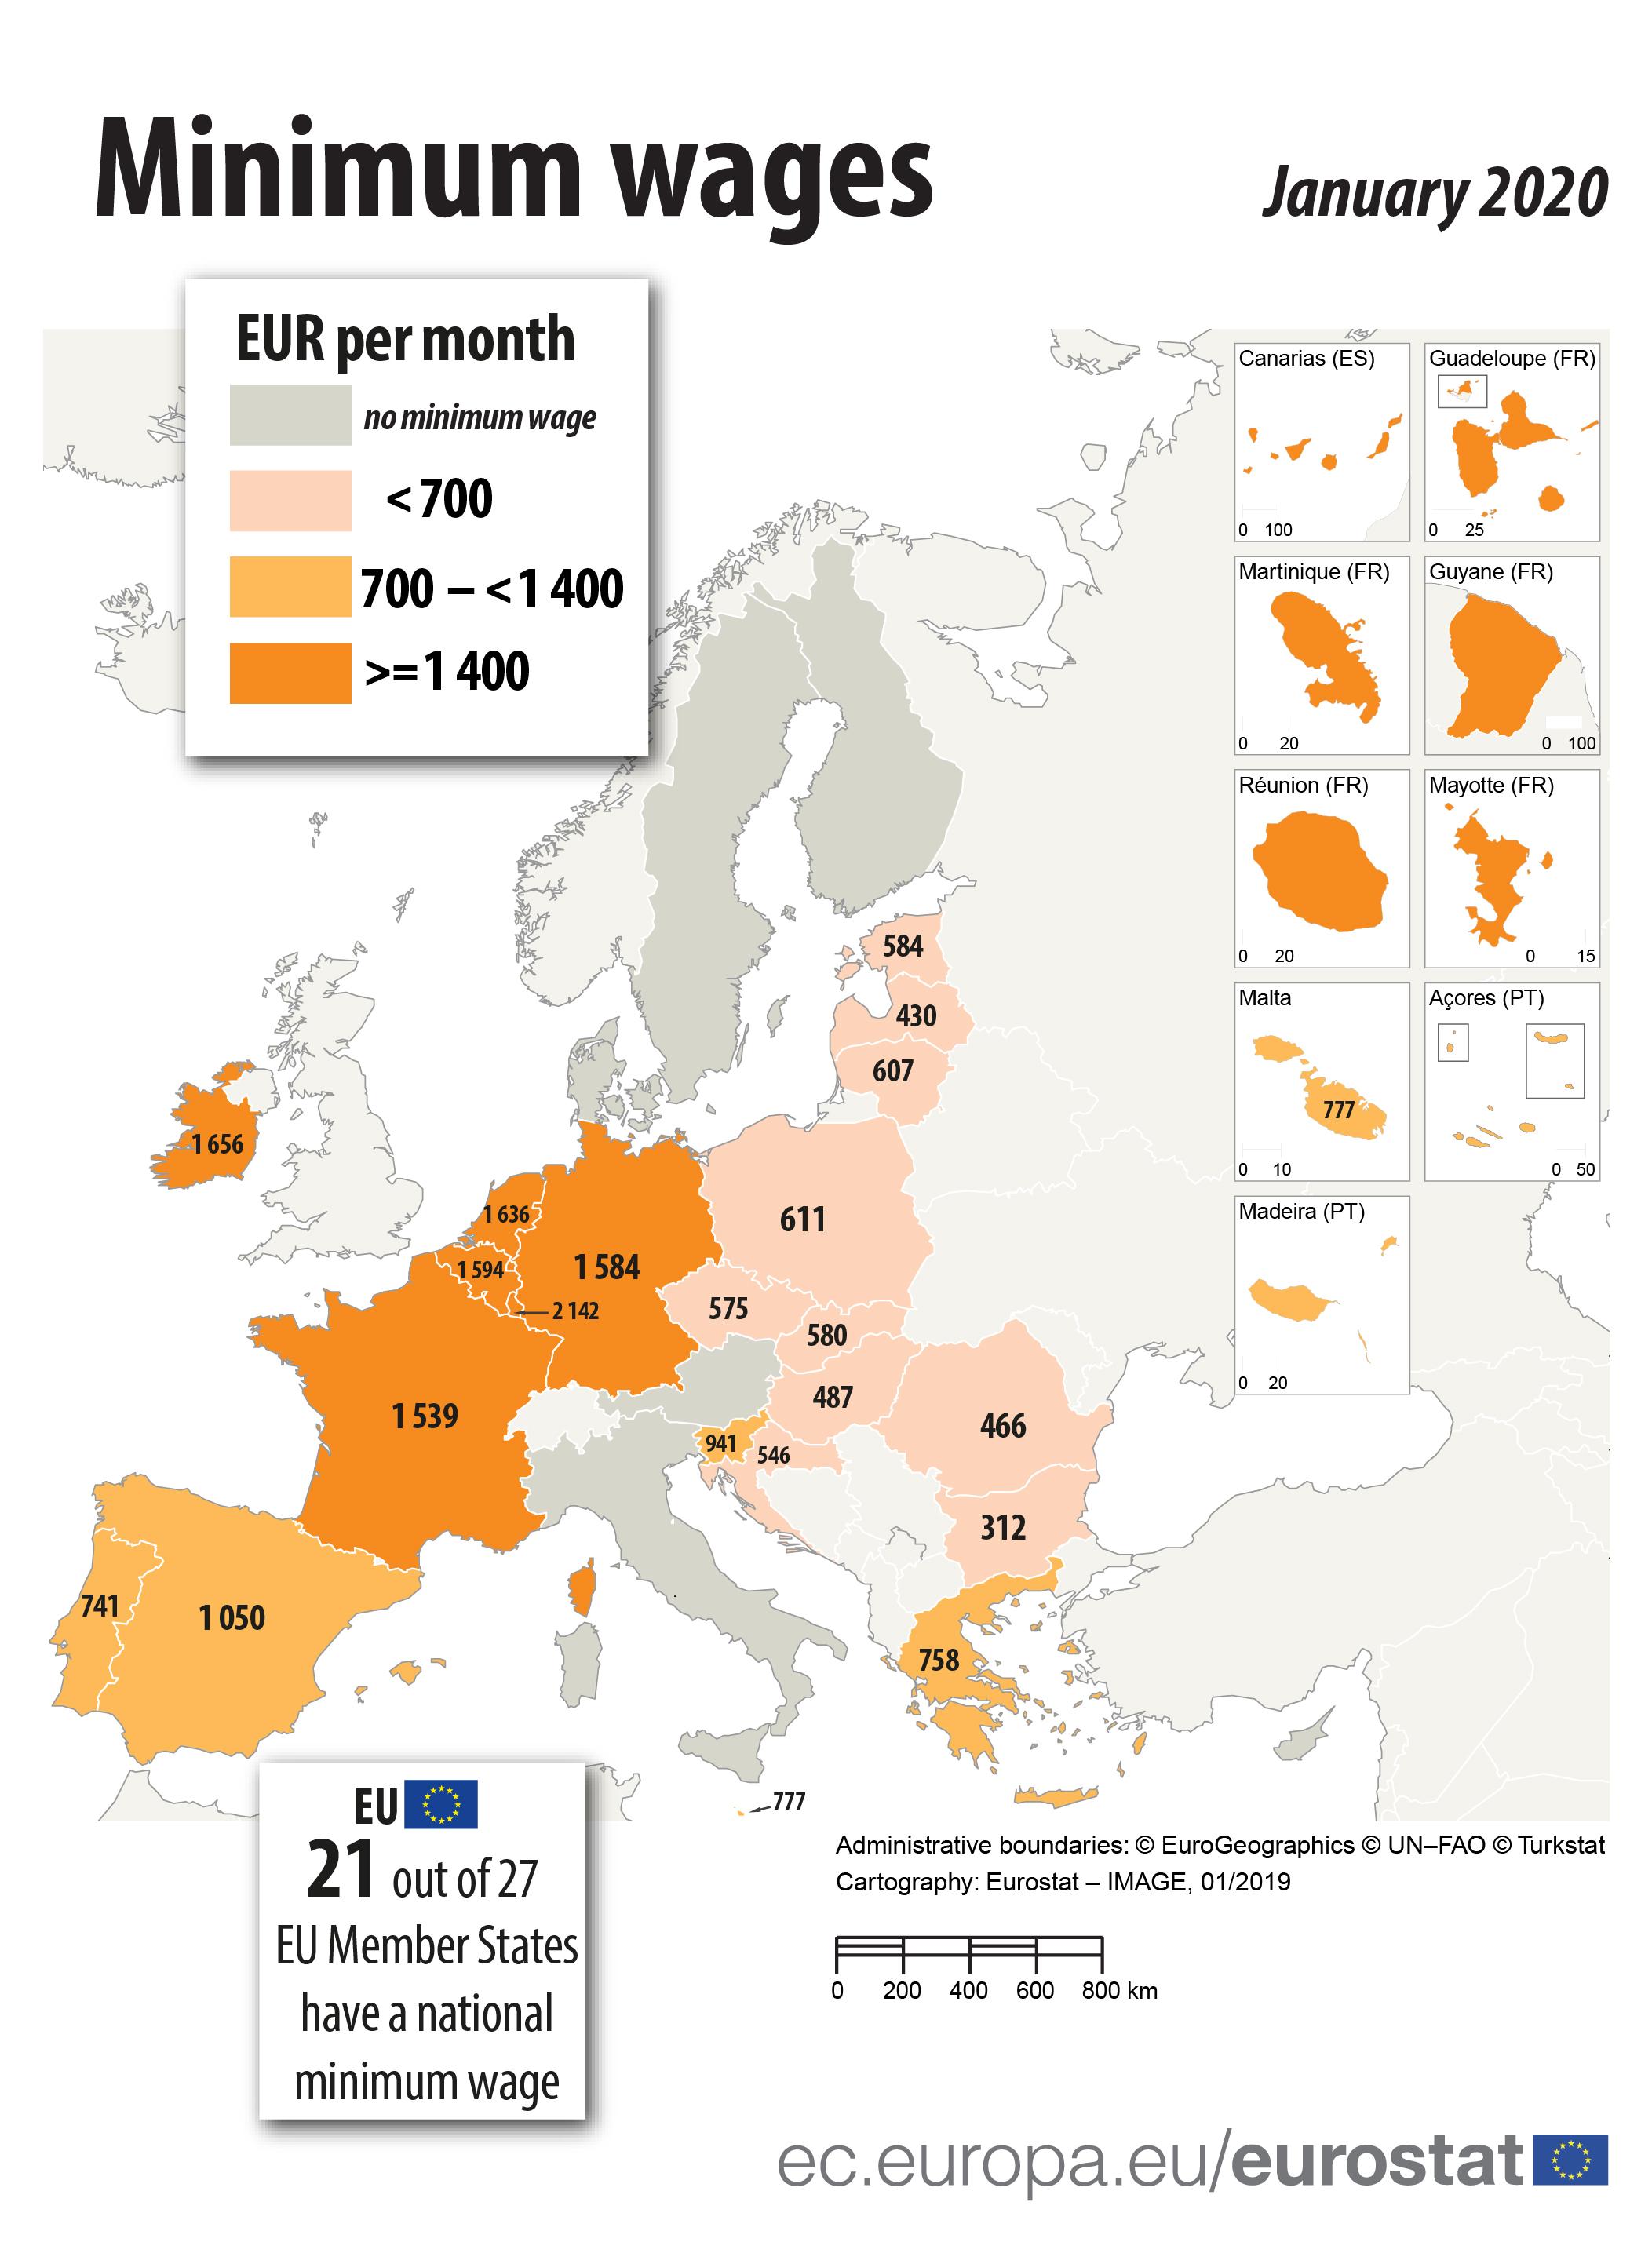 https://img.eurointegration.com.ua/images/doc/9/a/9ae2429-minimum-wages-january2020.jpg